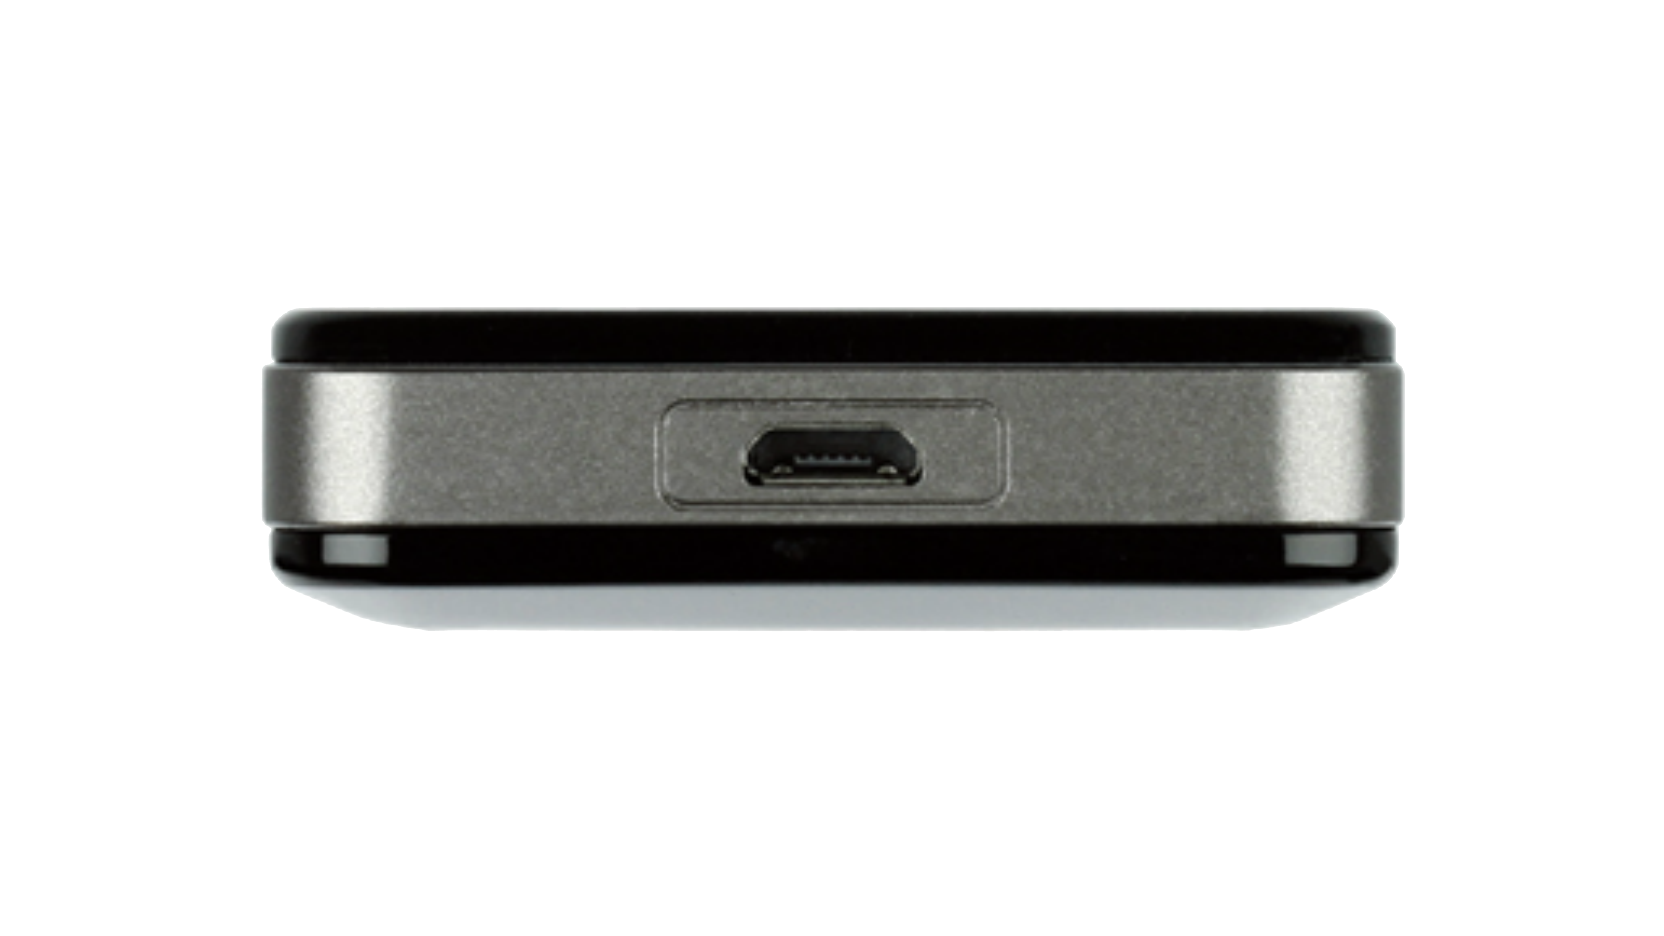 D-Link DWR-730 Router Windows Vista 32-BIT